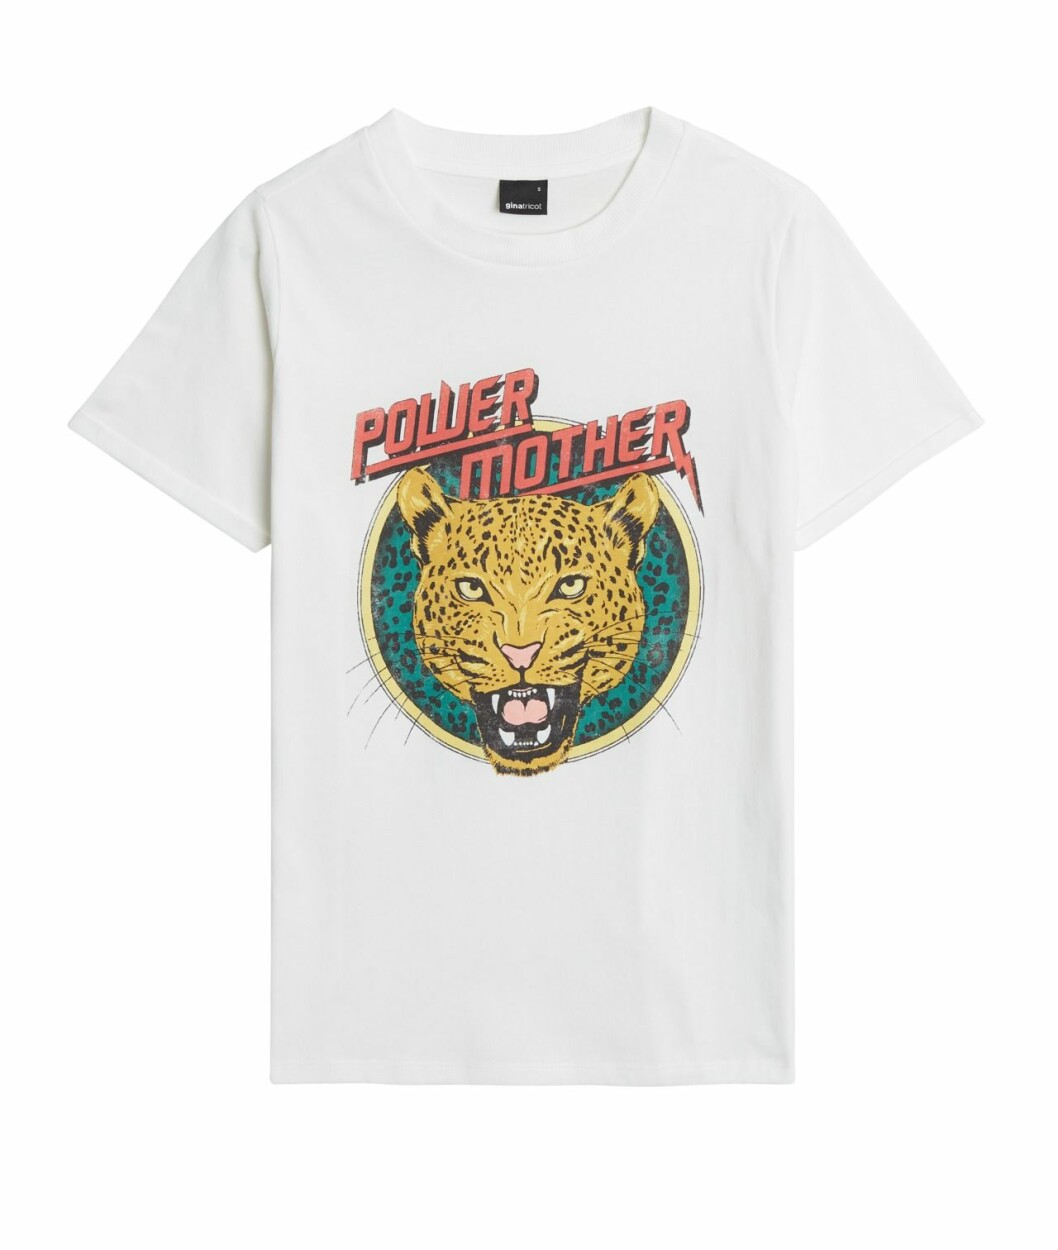 Gina tricot Mini mor- och barnkollektion –mönstrad vit t-shirt